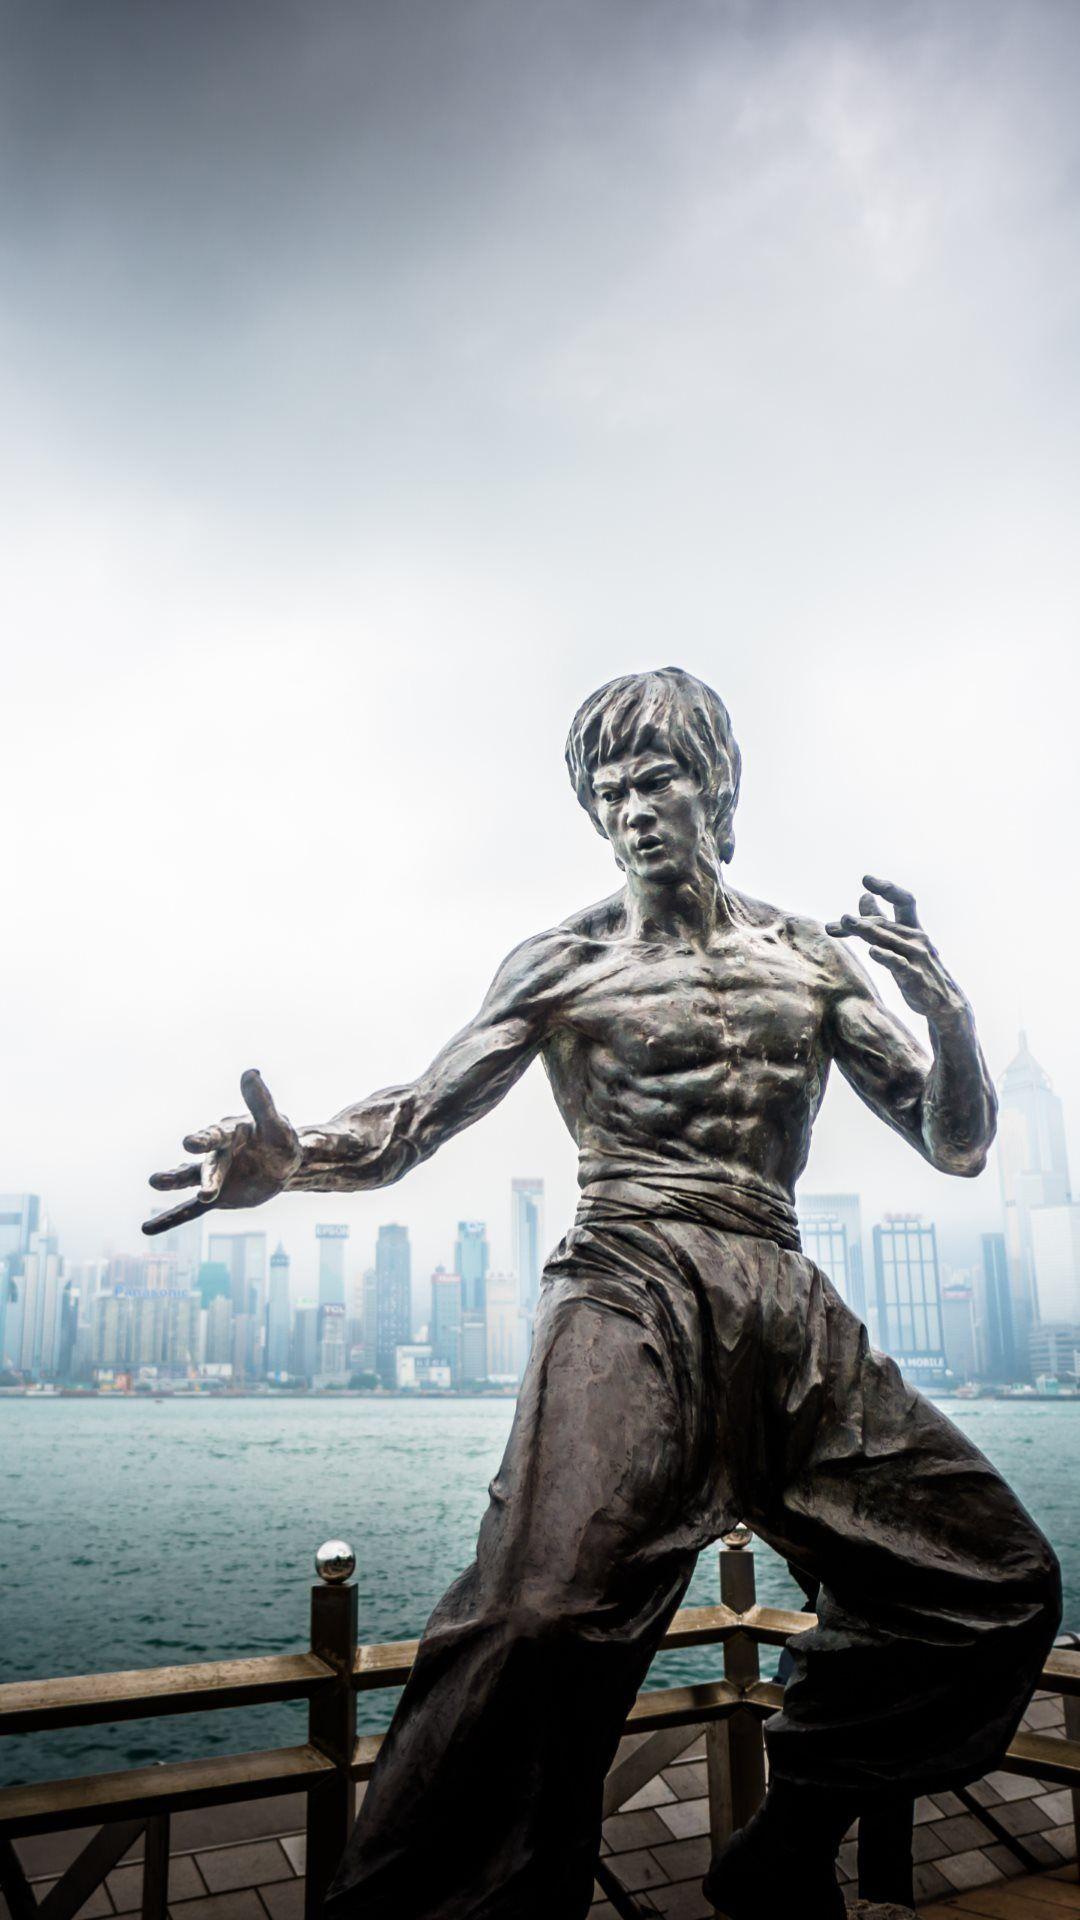 Michael Jordan Quotes Wallpaper For Iphone Bruce Lee Iphone Wallpaper Pixelstalk Net